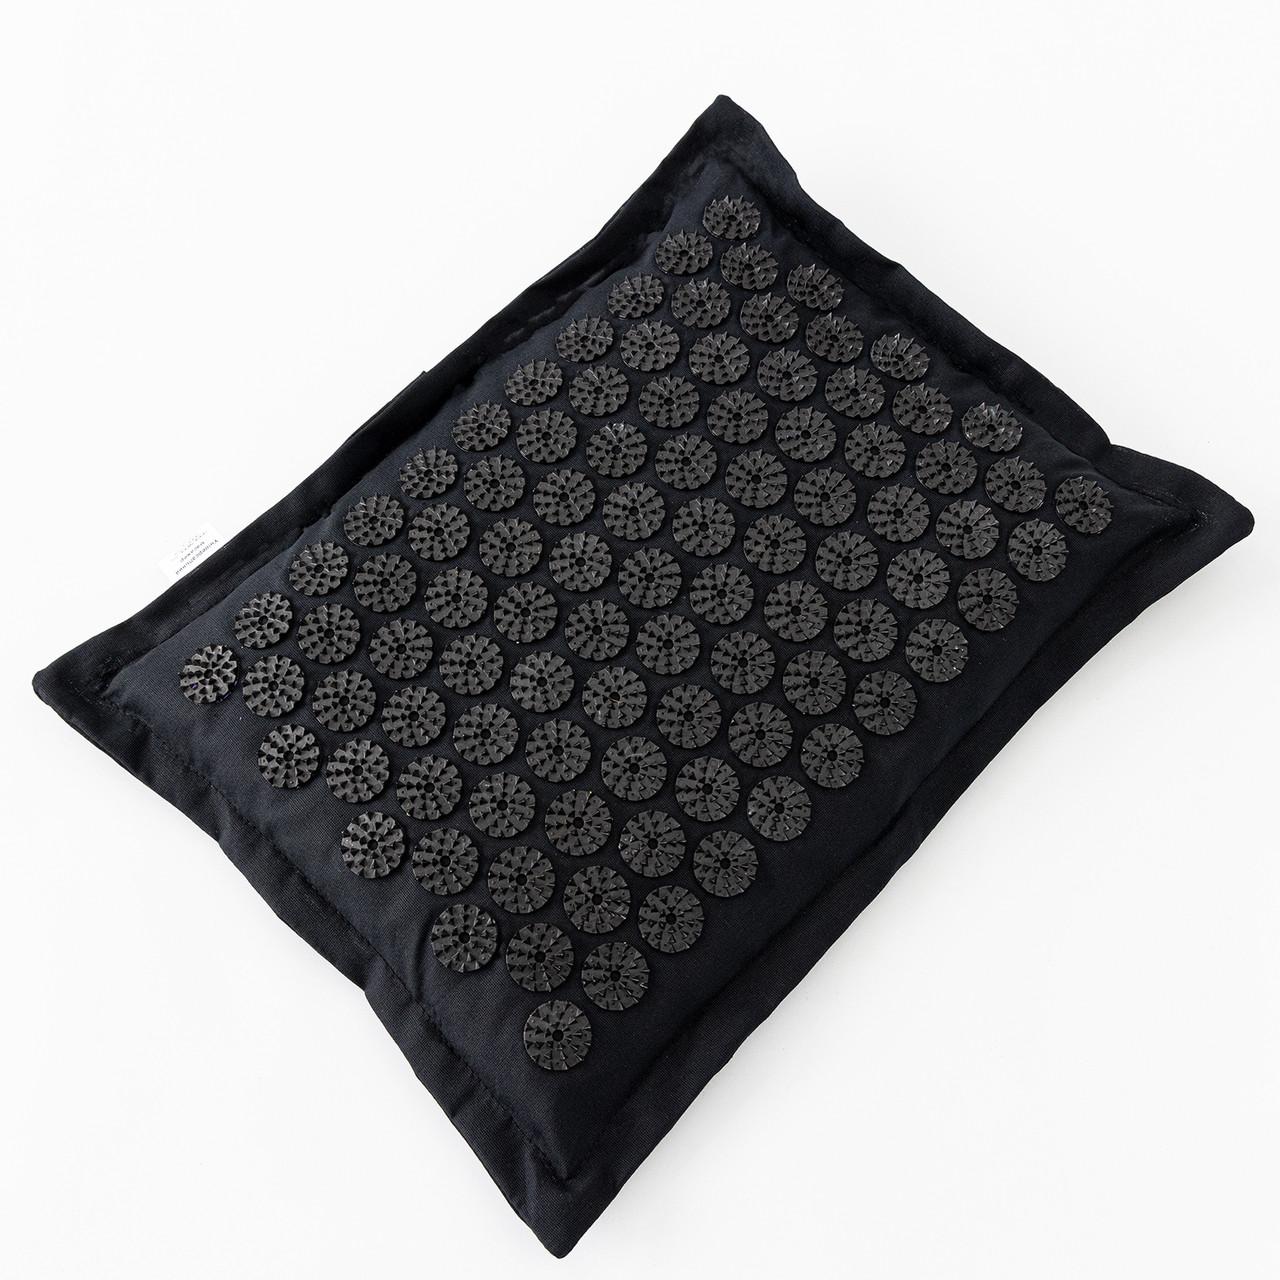 Масажна Подушка акупунктурна (аплікатор Кузнєцова) масажер для голови/шиї/спини OSPORT Premium (apl-017)